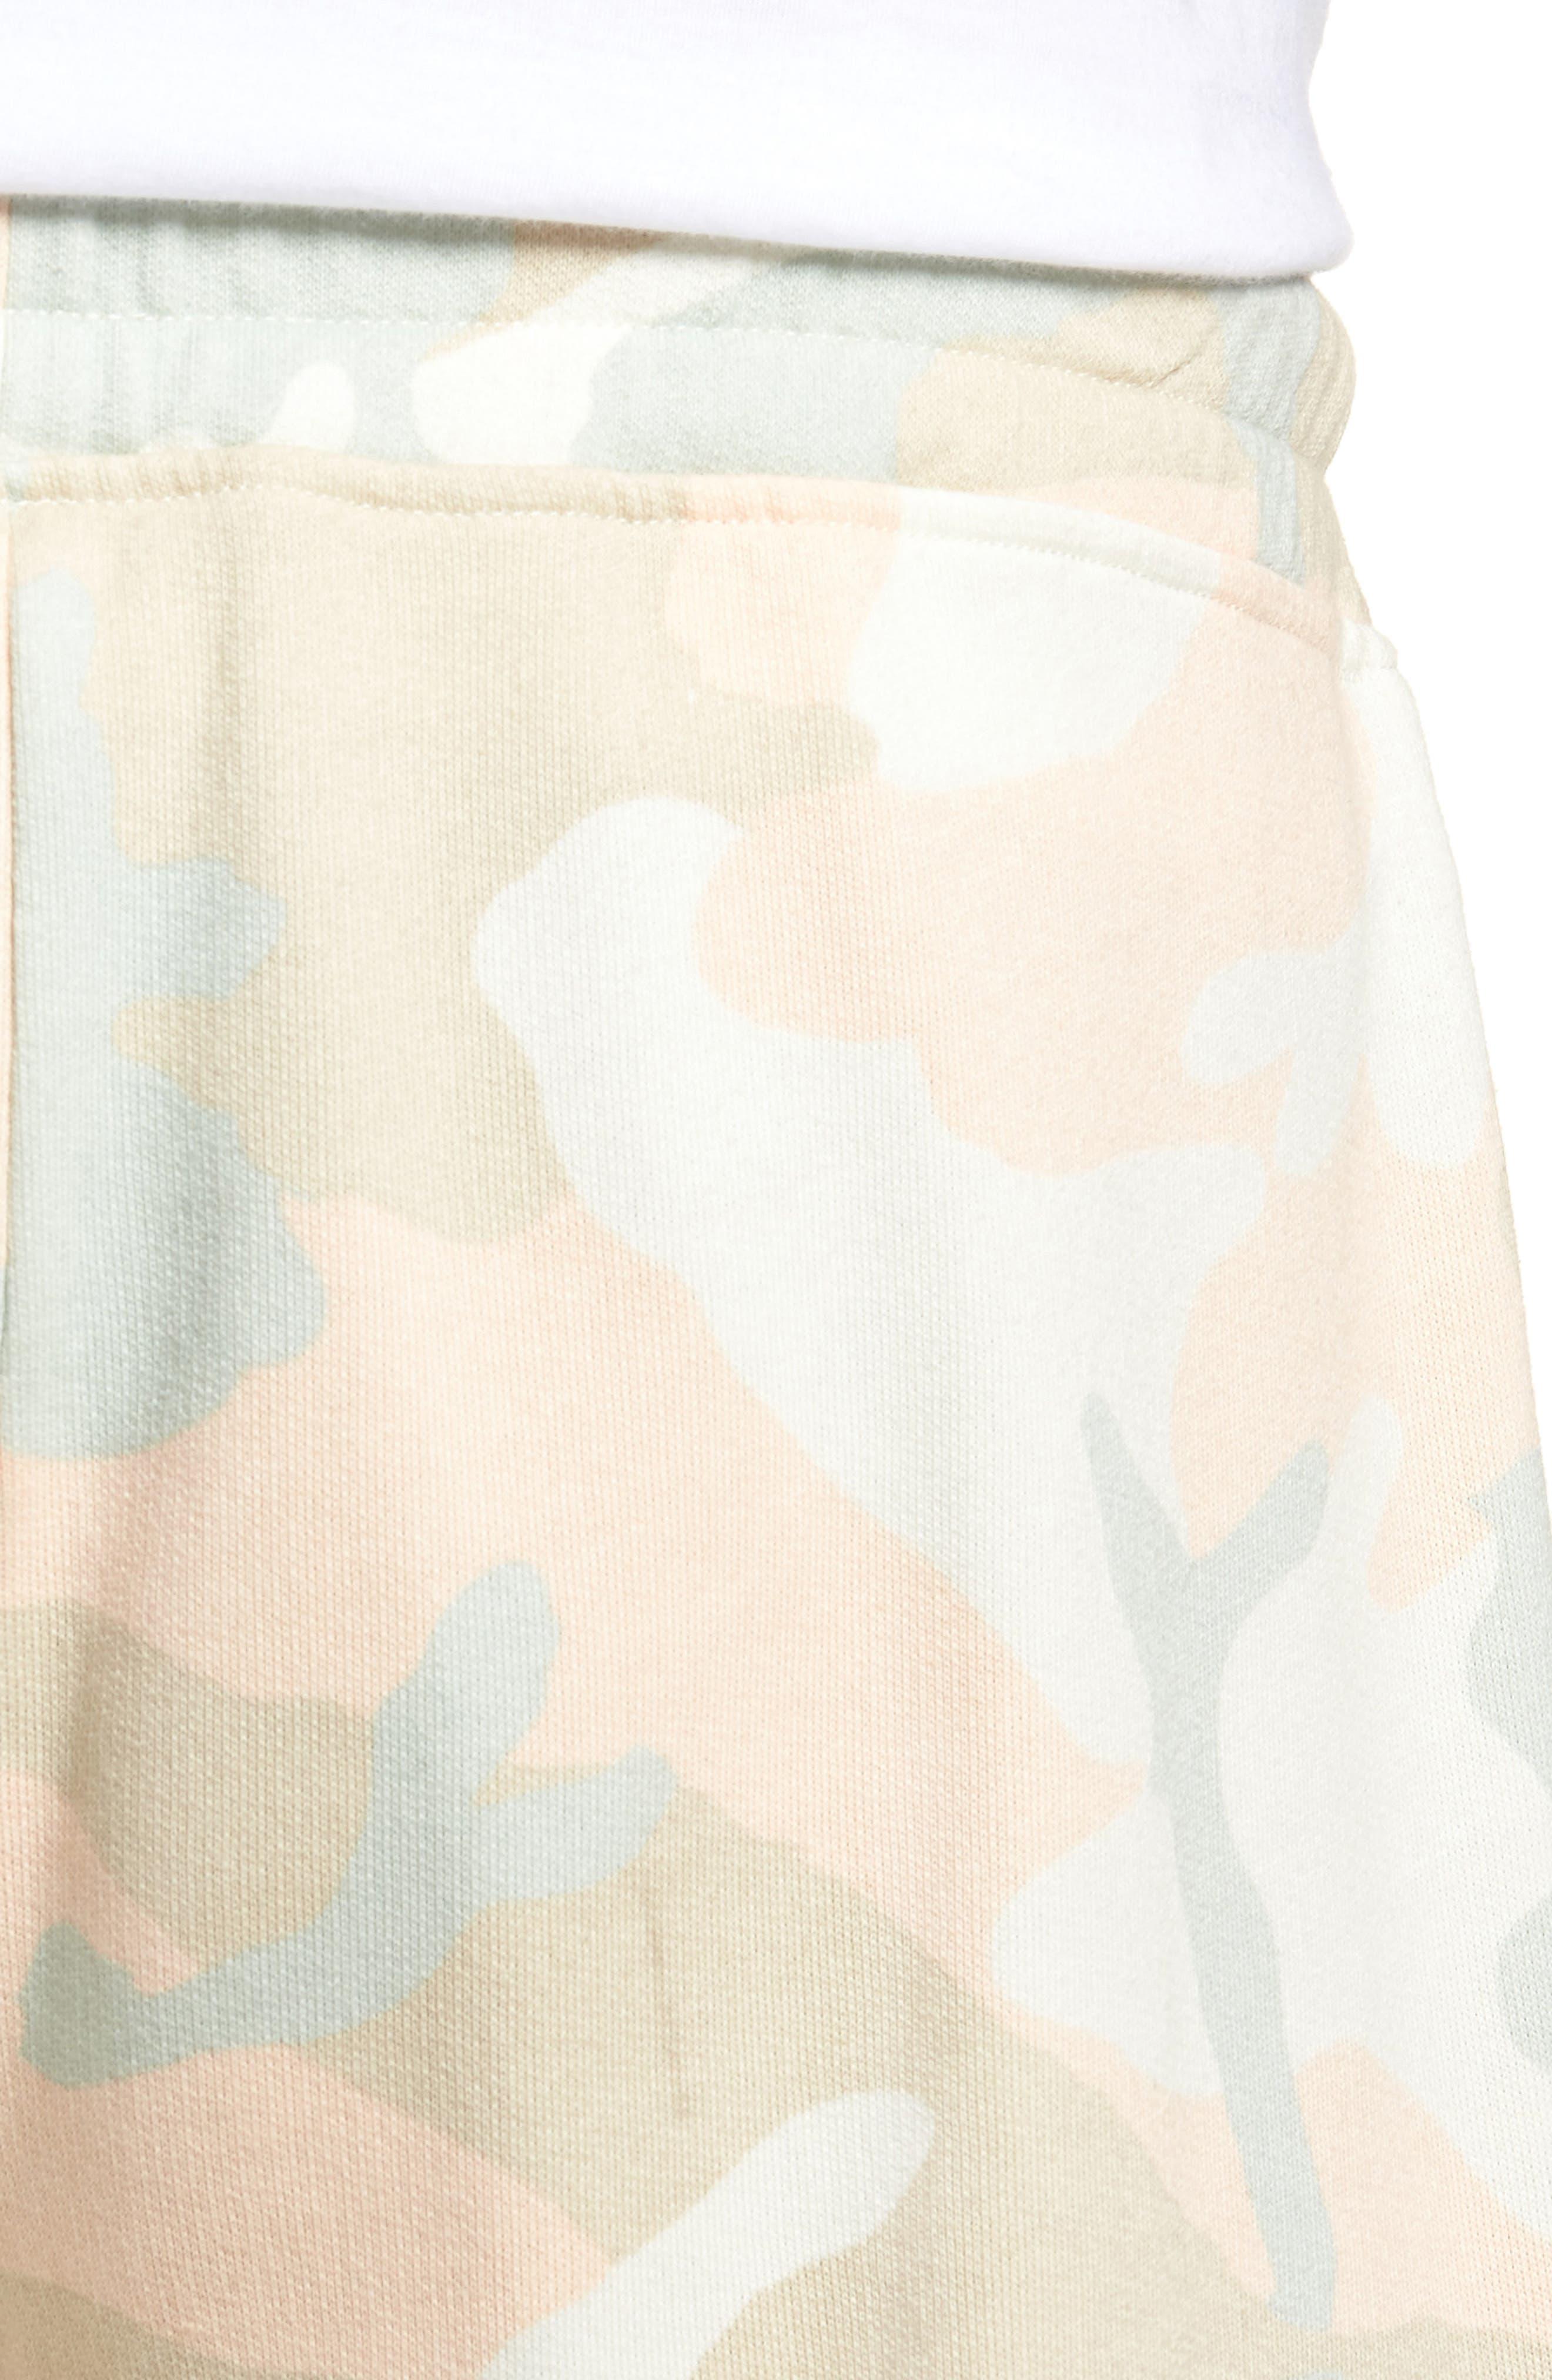 Alternate Image 4  - WeSC Marty Pastel Camo Fleece Shorts